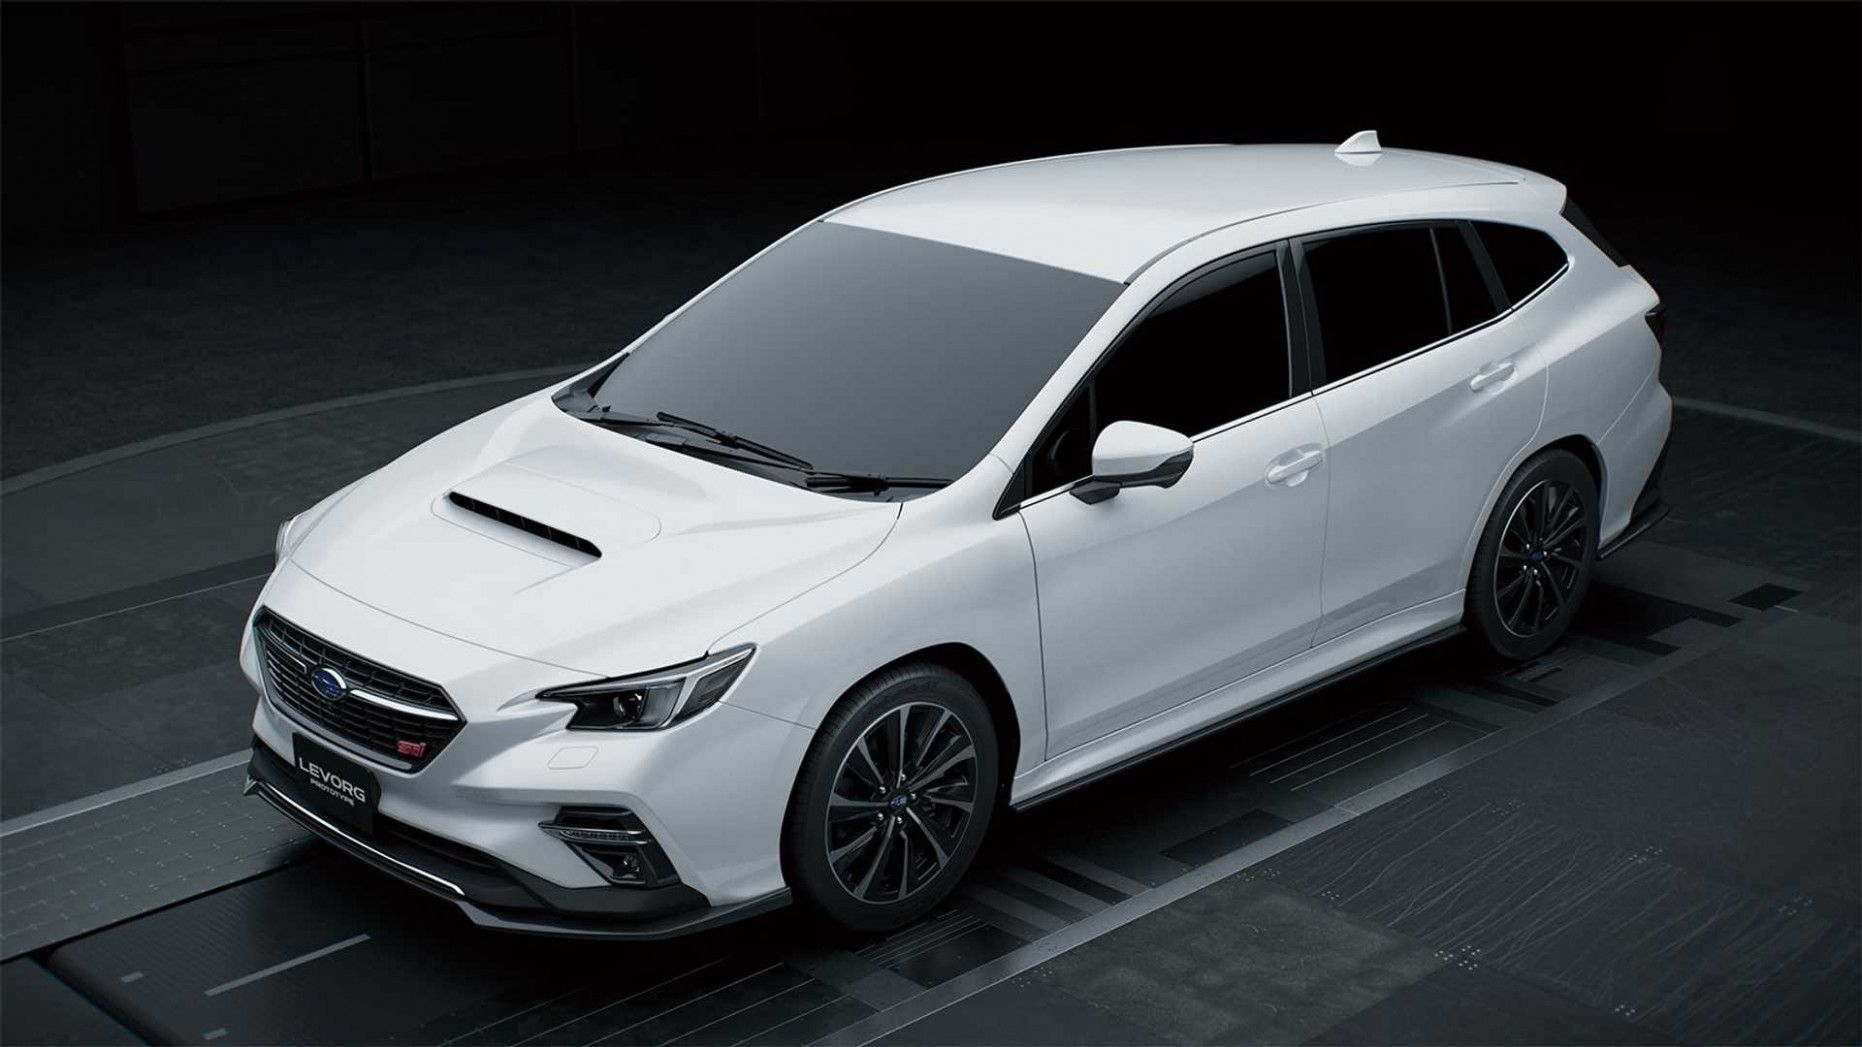 2020 Subaru Autos In 2020 Subaru Levorg Subaru Wrx Hatchback Subaru Wrx Wagon